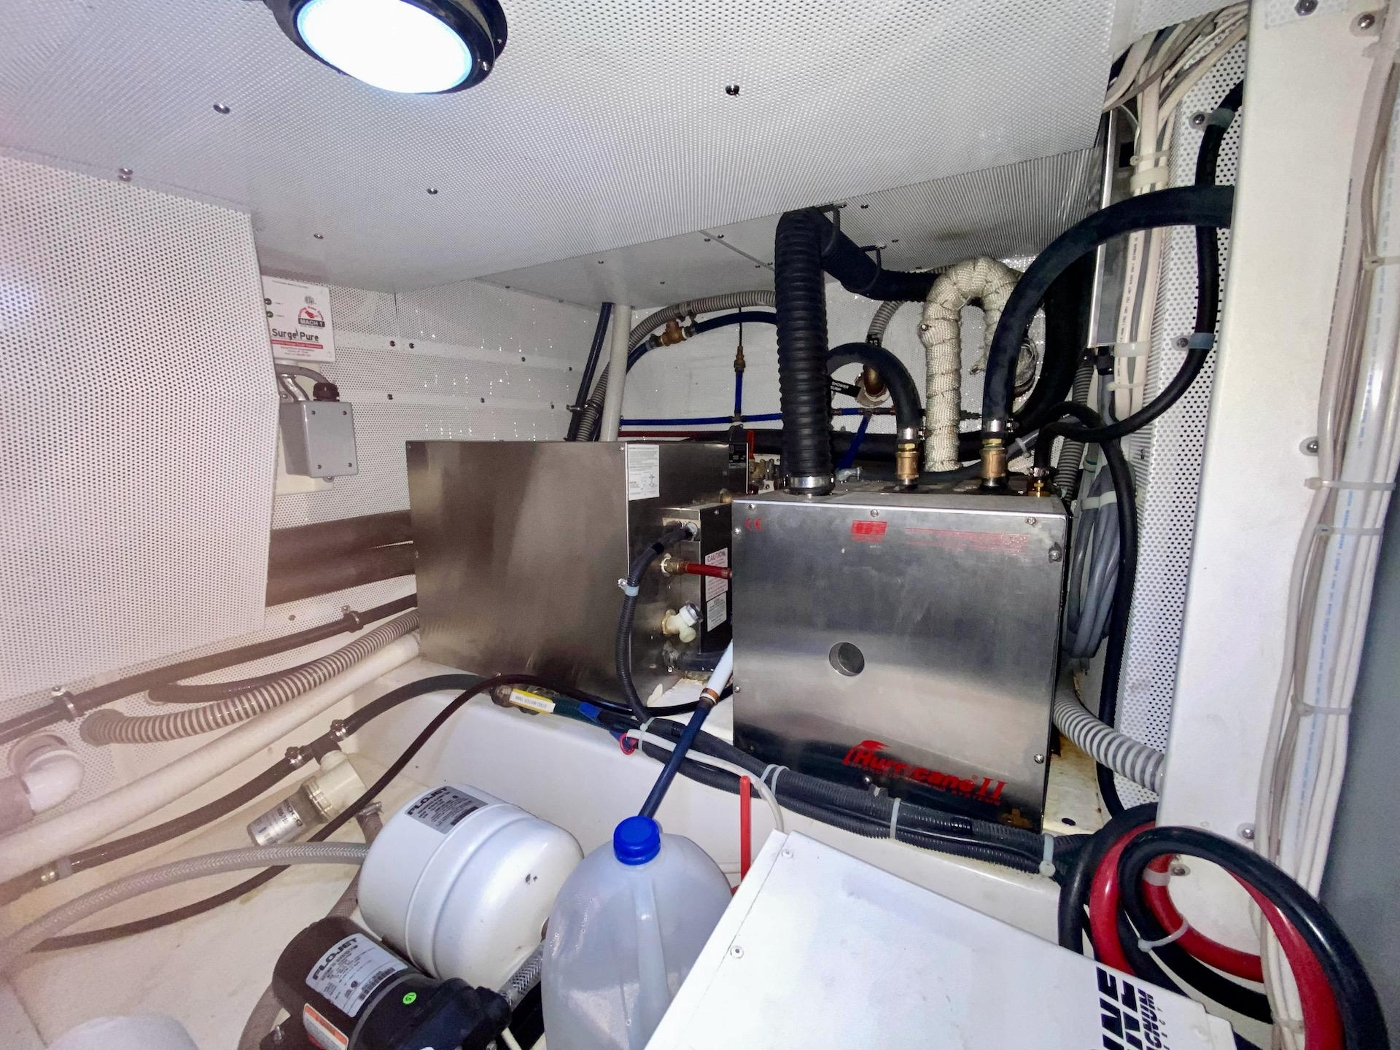 2010 Bracewell 41, Machinery Space Detail 1